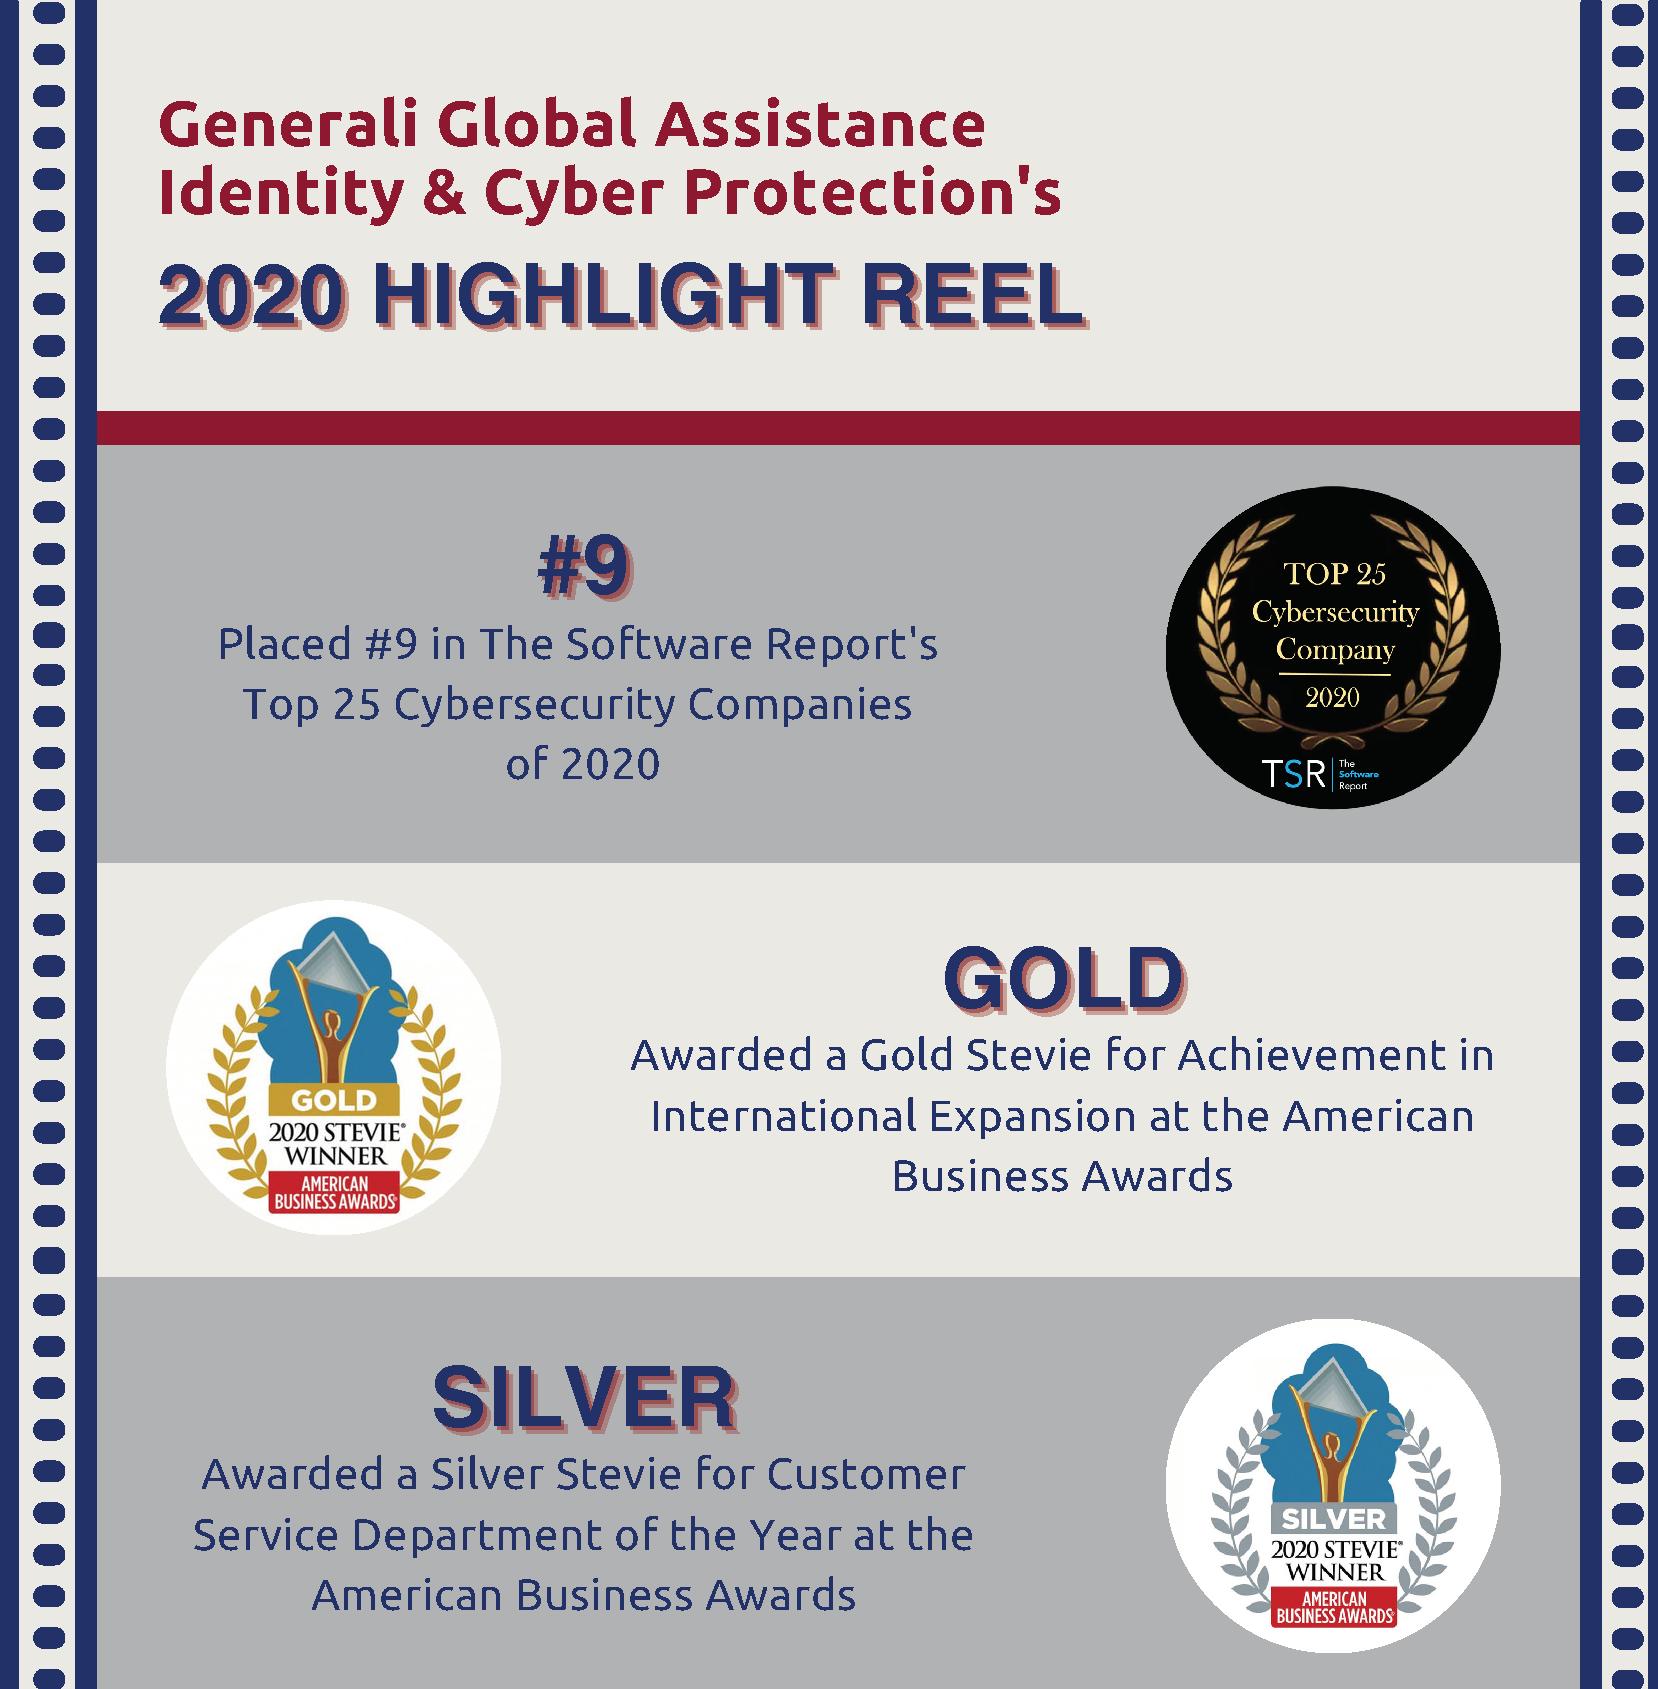 GGA IDP 2020 HIGHLIGHT REEL_final